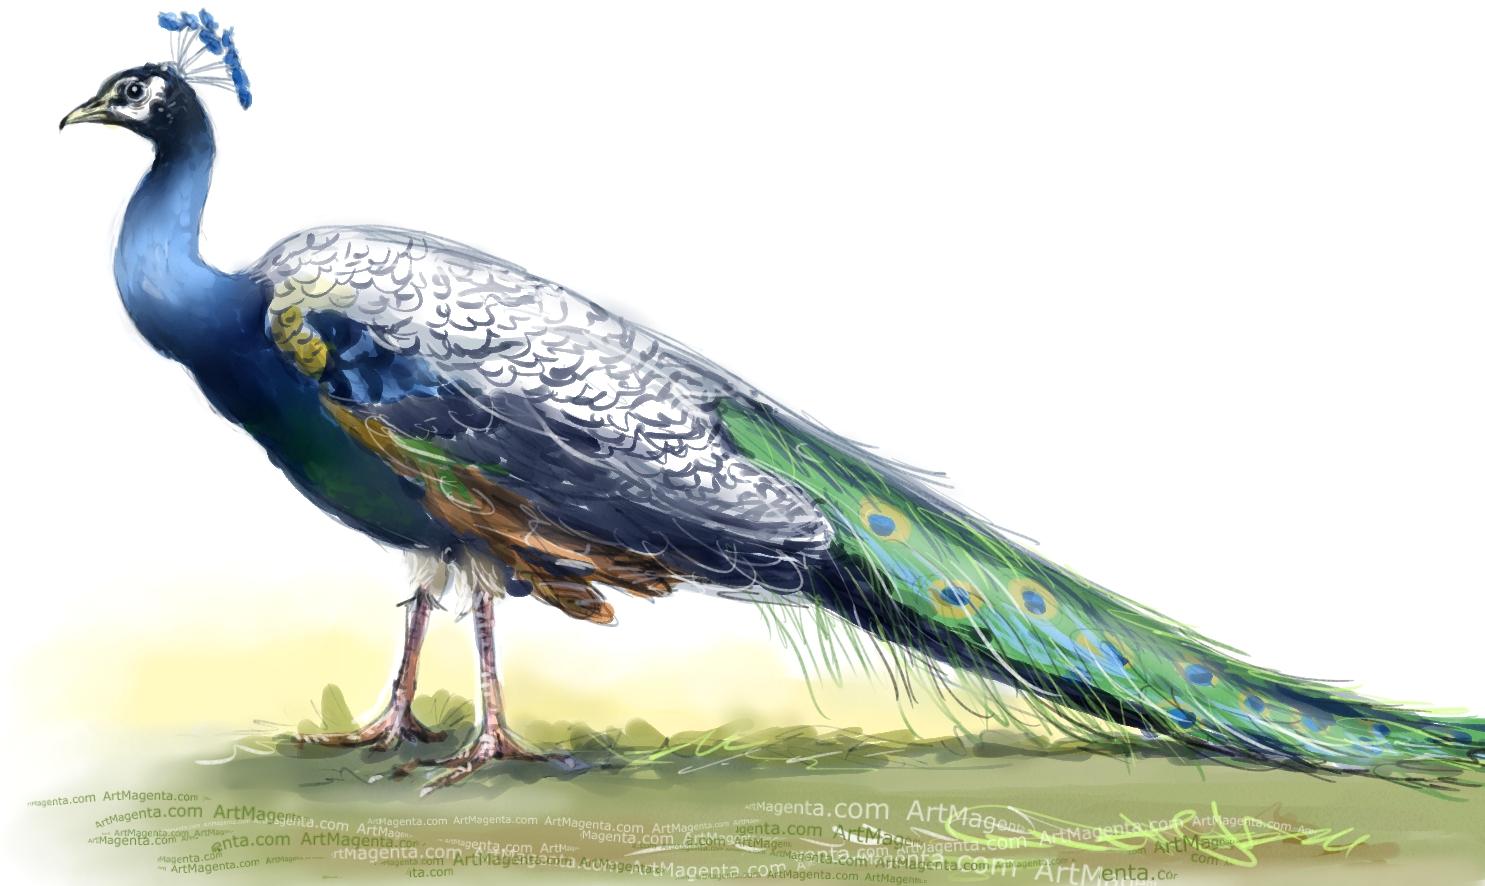 Indian Peafowl sketch painting. Bird art drawing by illustrator Artmagenta